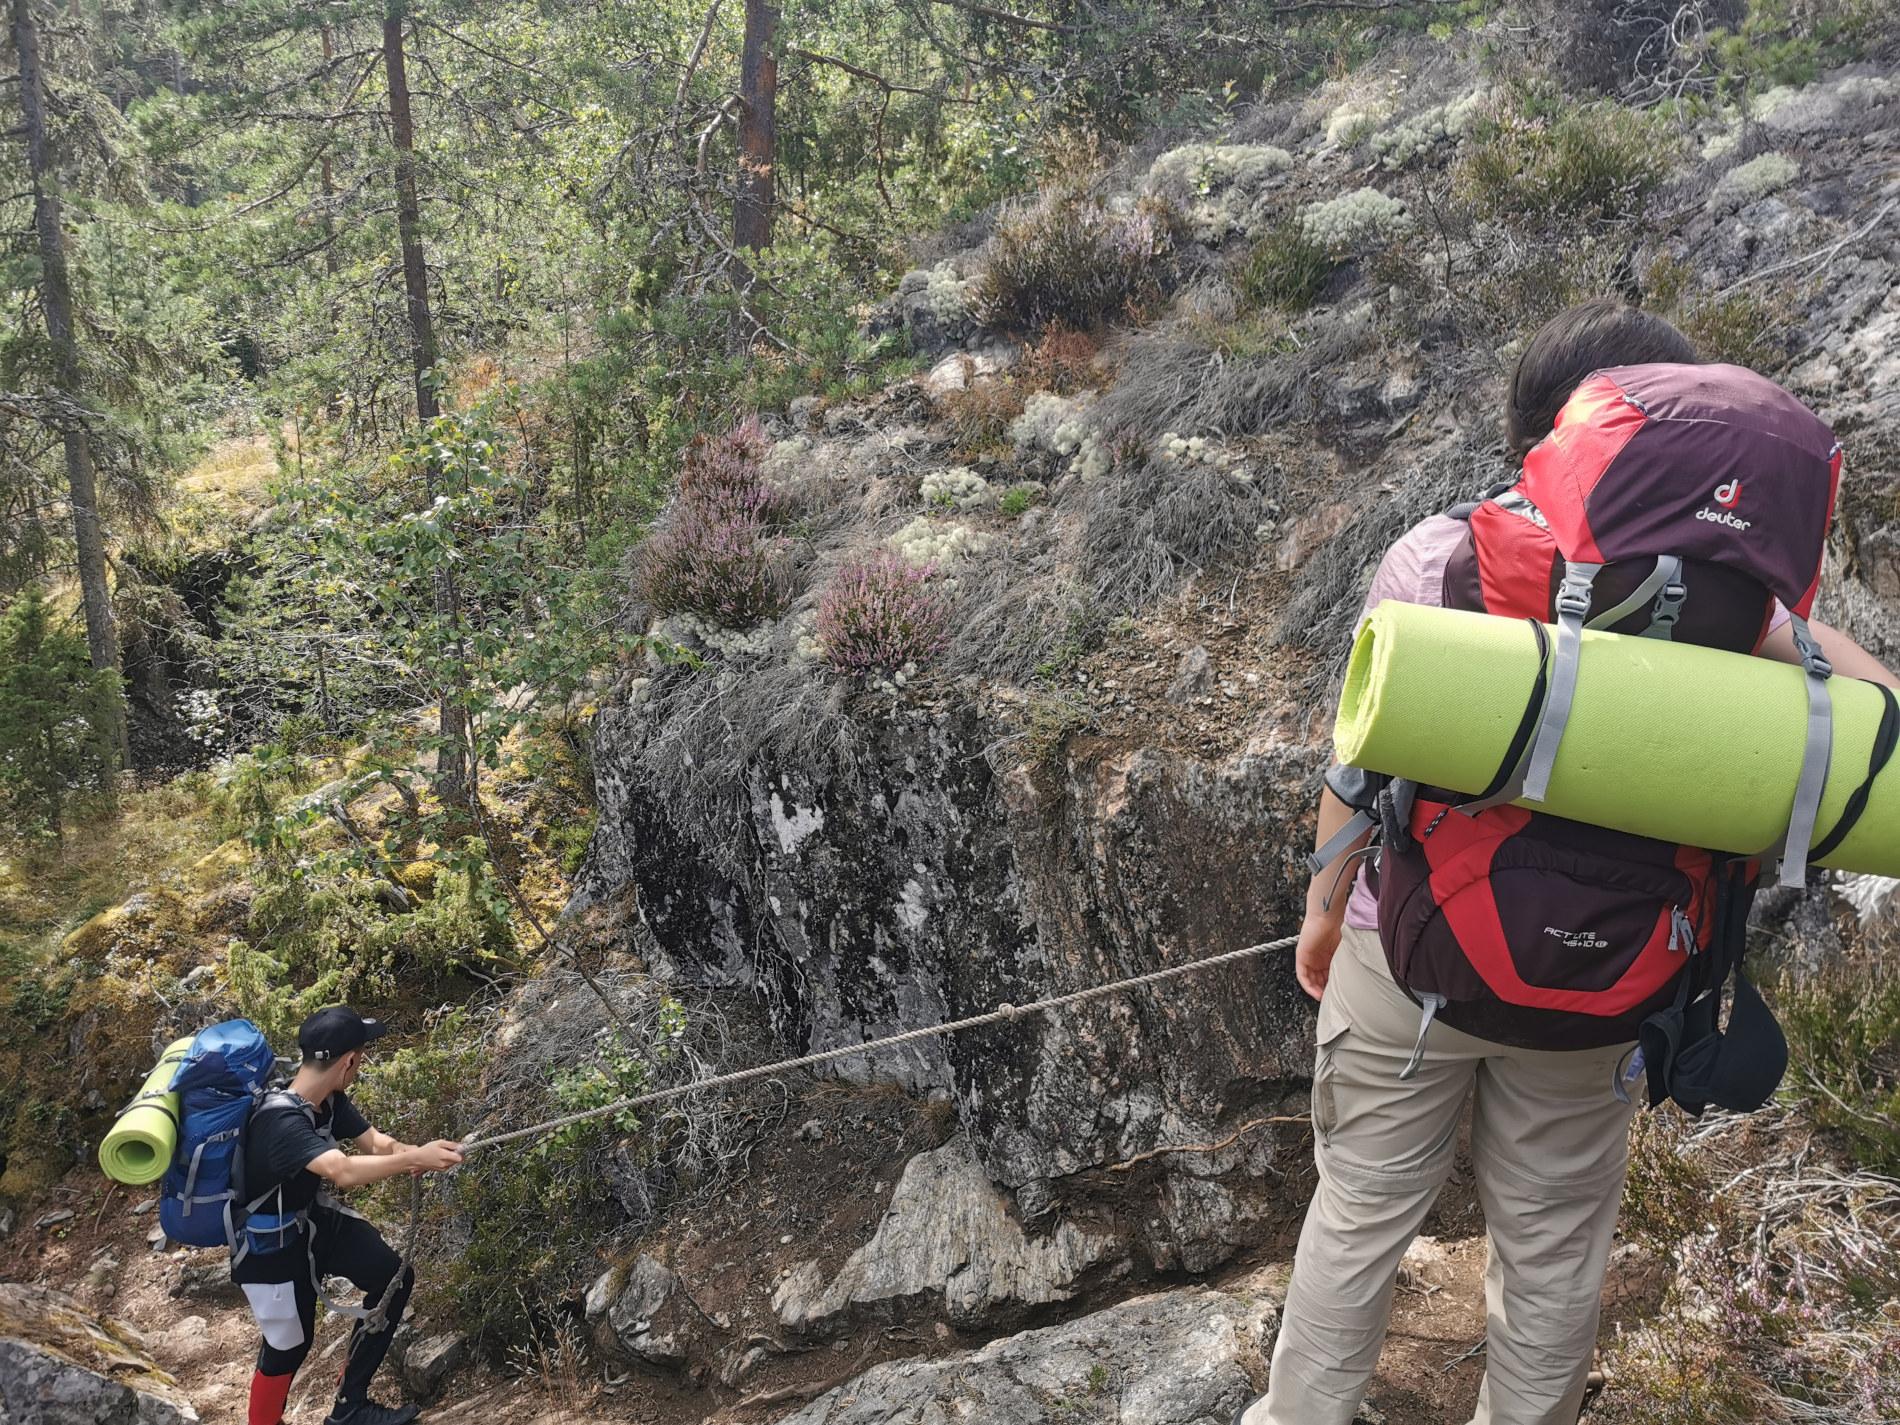 Sörmlandsleden Klettern mit Seil